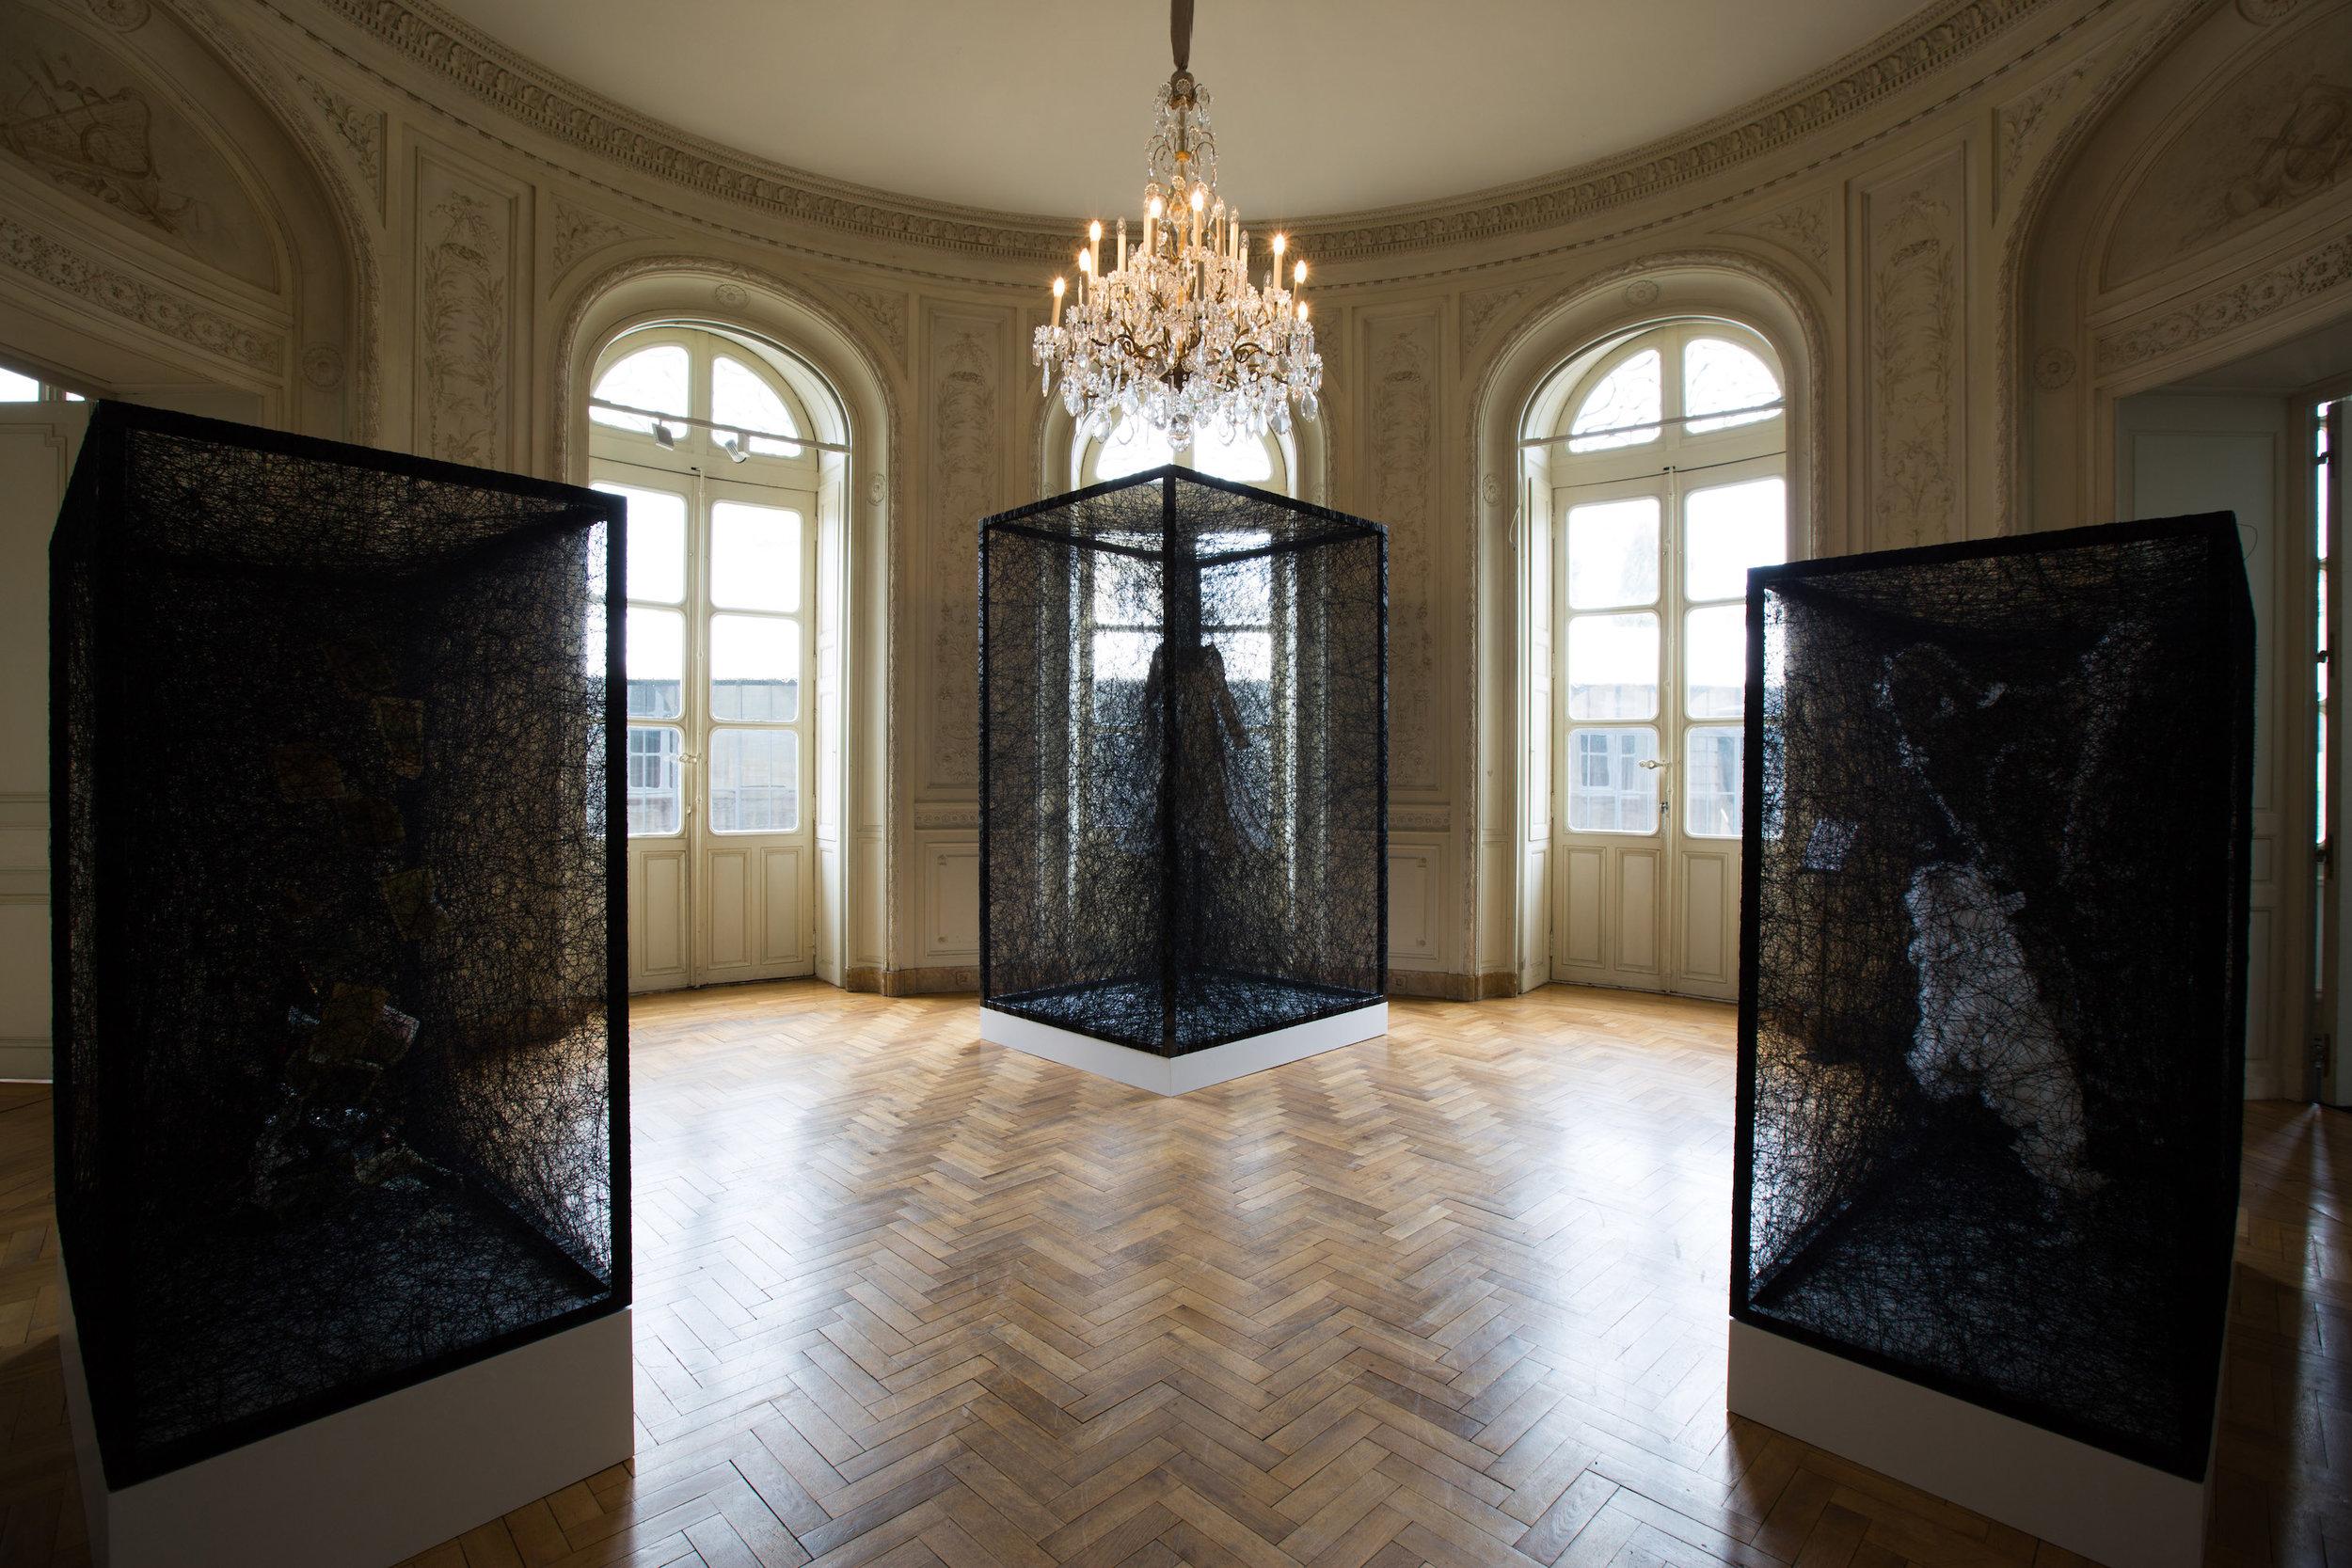 2017_Exposition Daniel Templon_Institut Culturel Bernard Magrez_Photo Constant Formé Bècherat_01.jpg